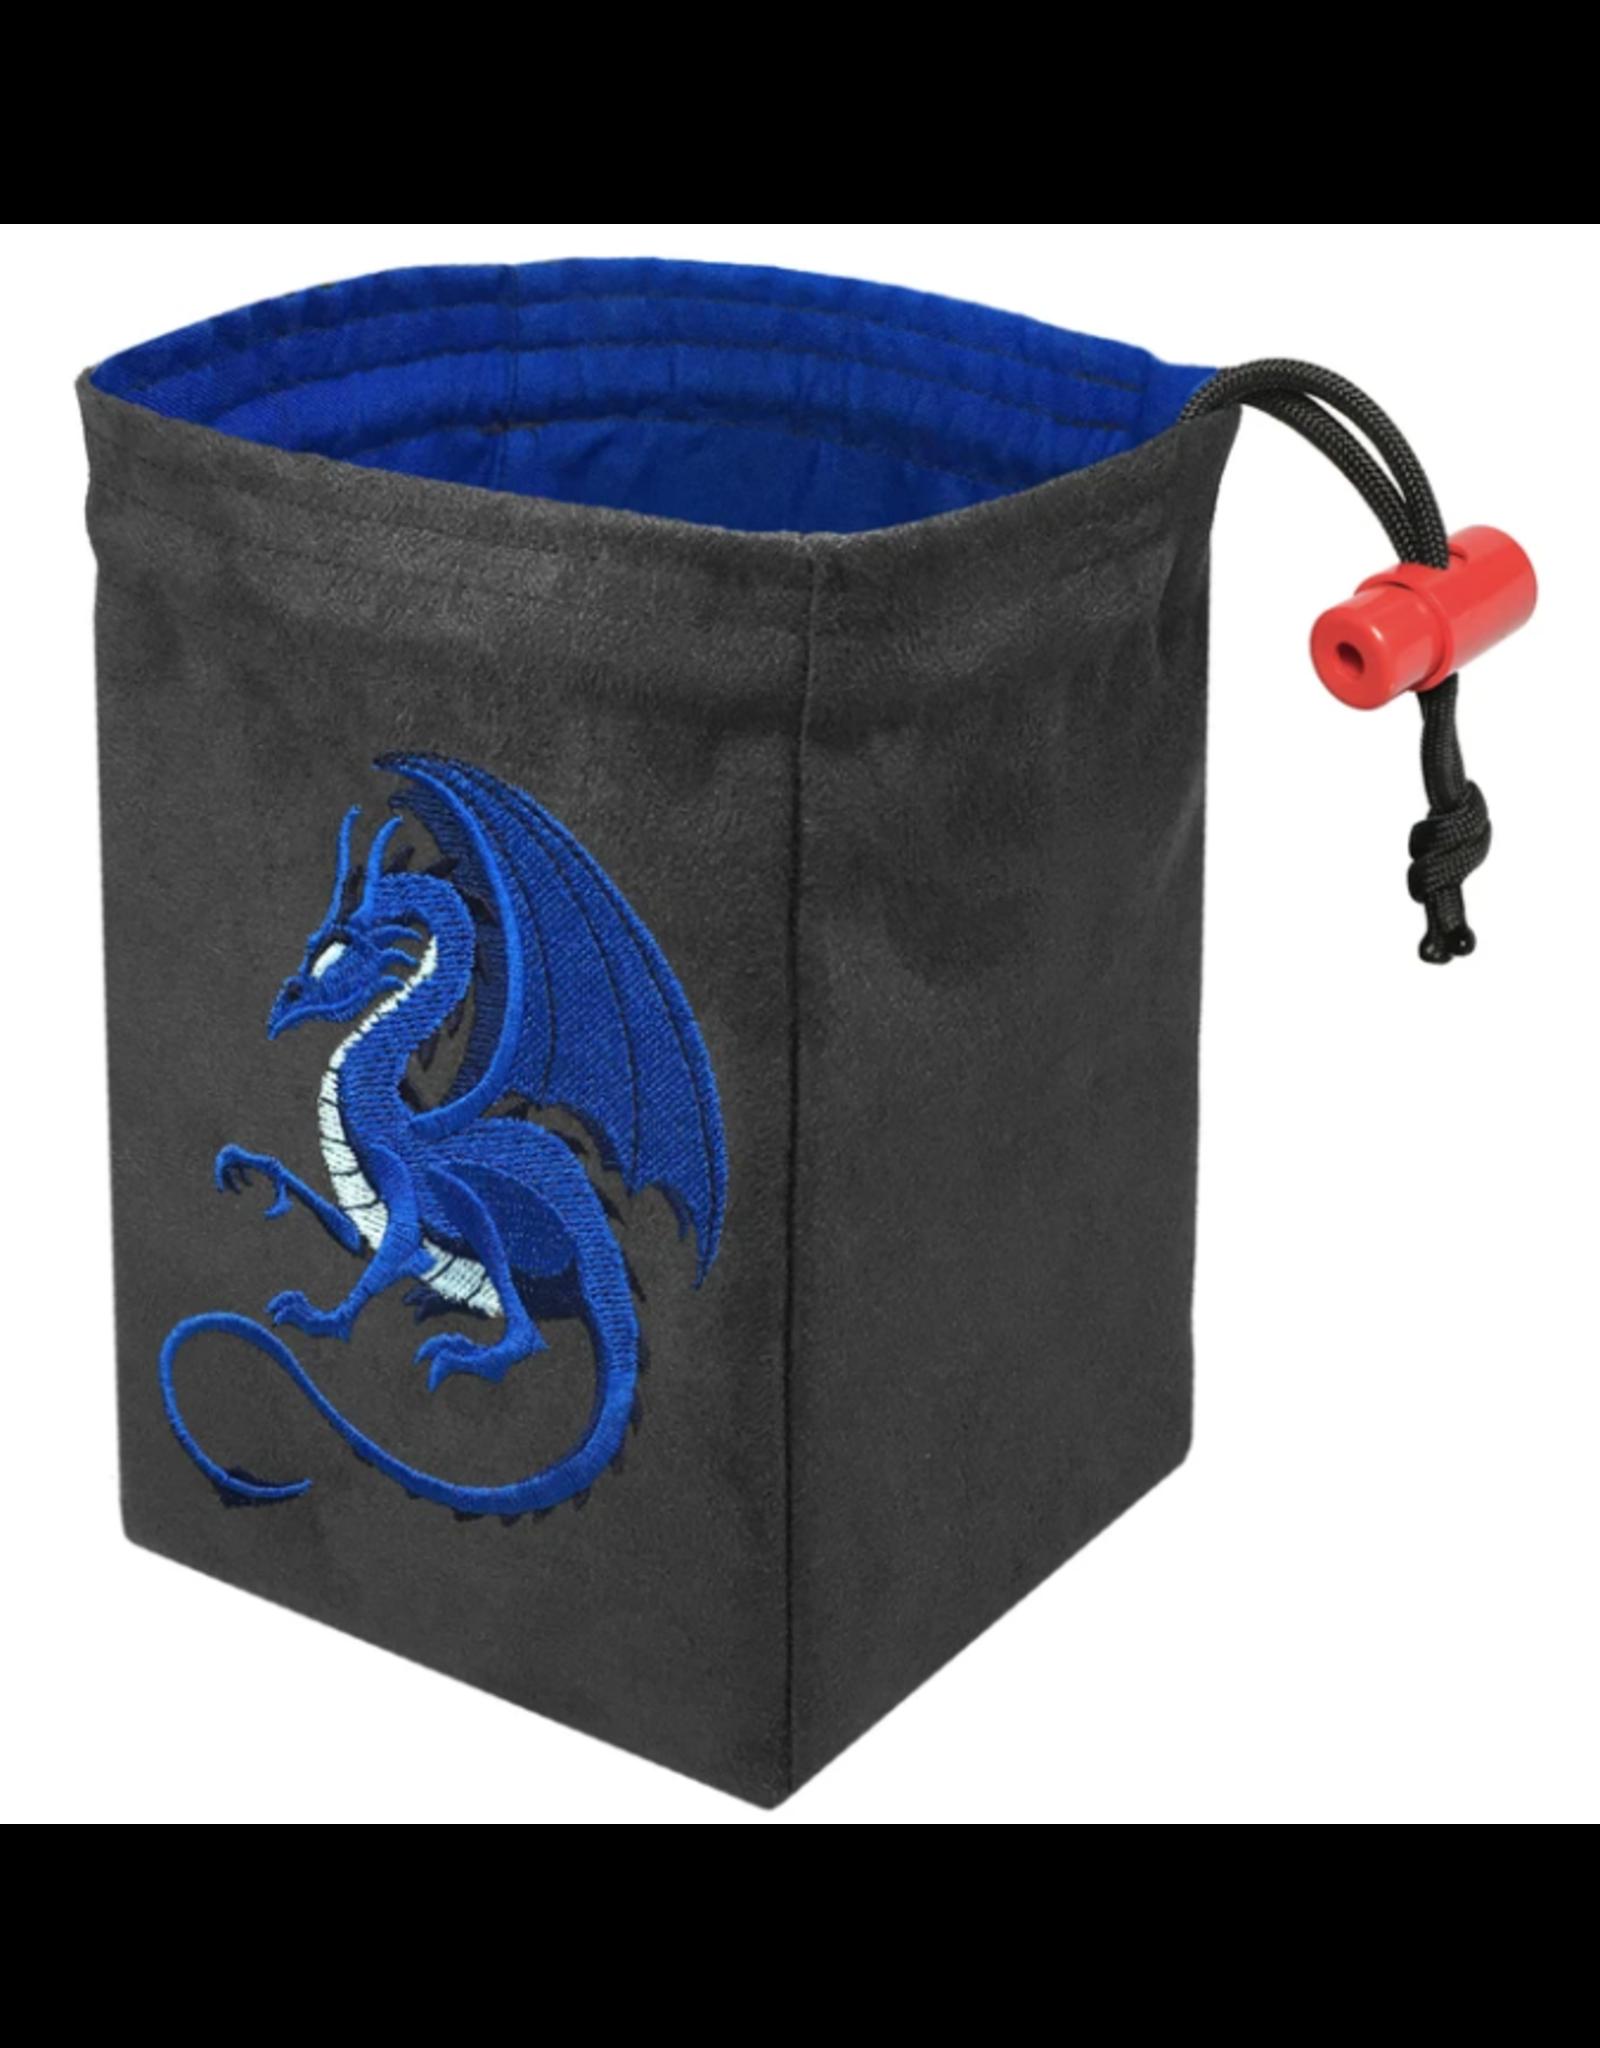 Dice Fantasy Blue Dragon Embroidered Dice Bag